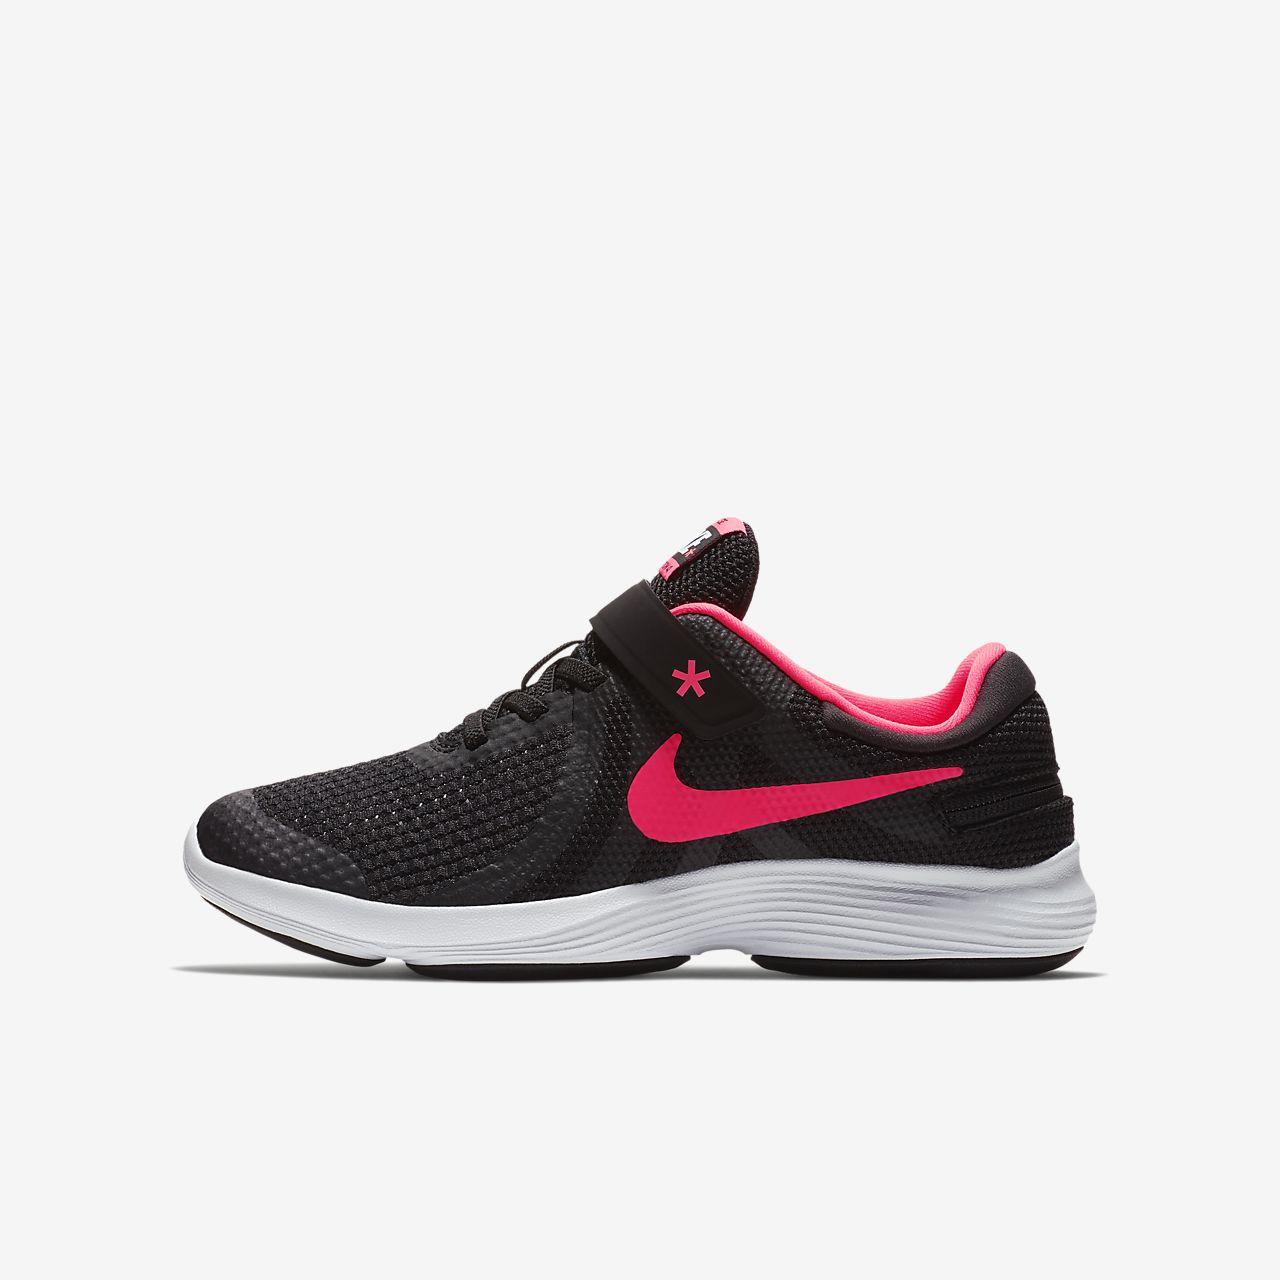 ... Nike Revolution 4 FlyEase Big Kids' Running Shoe